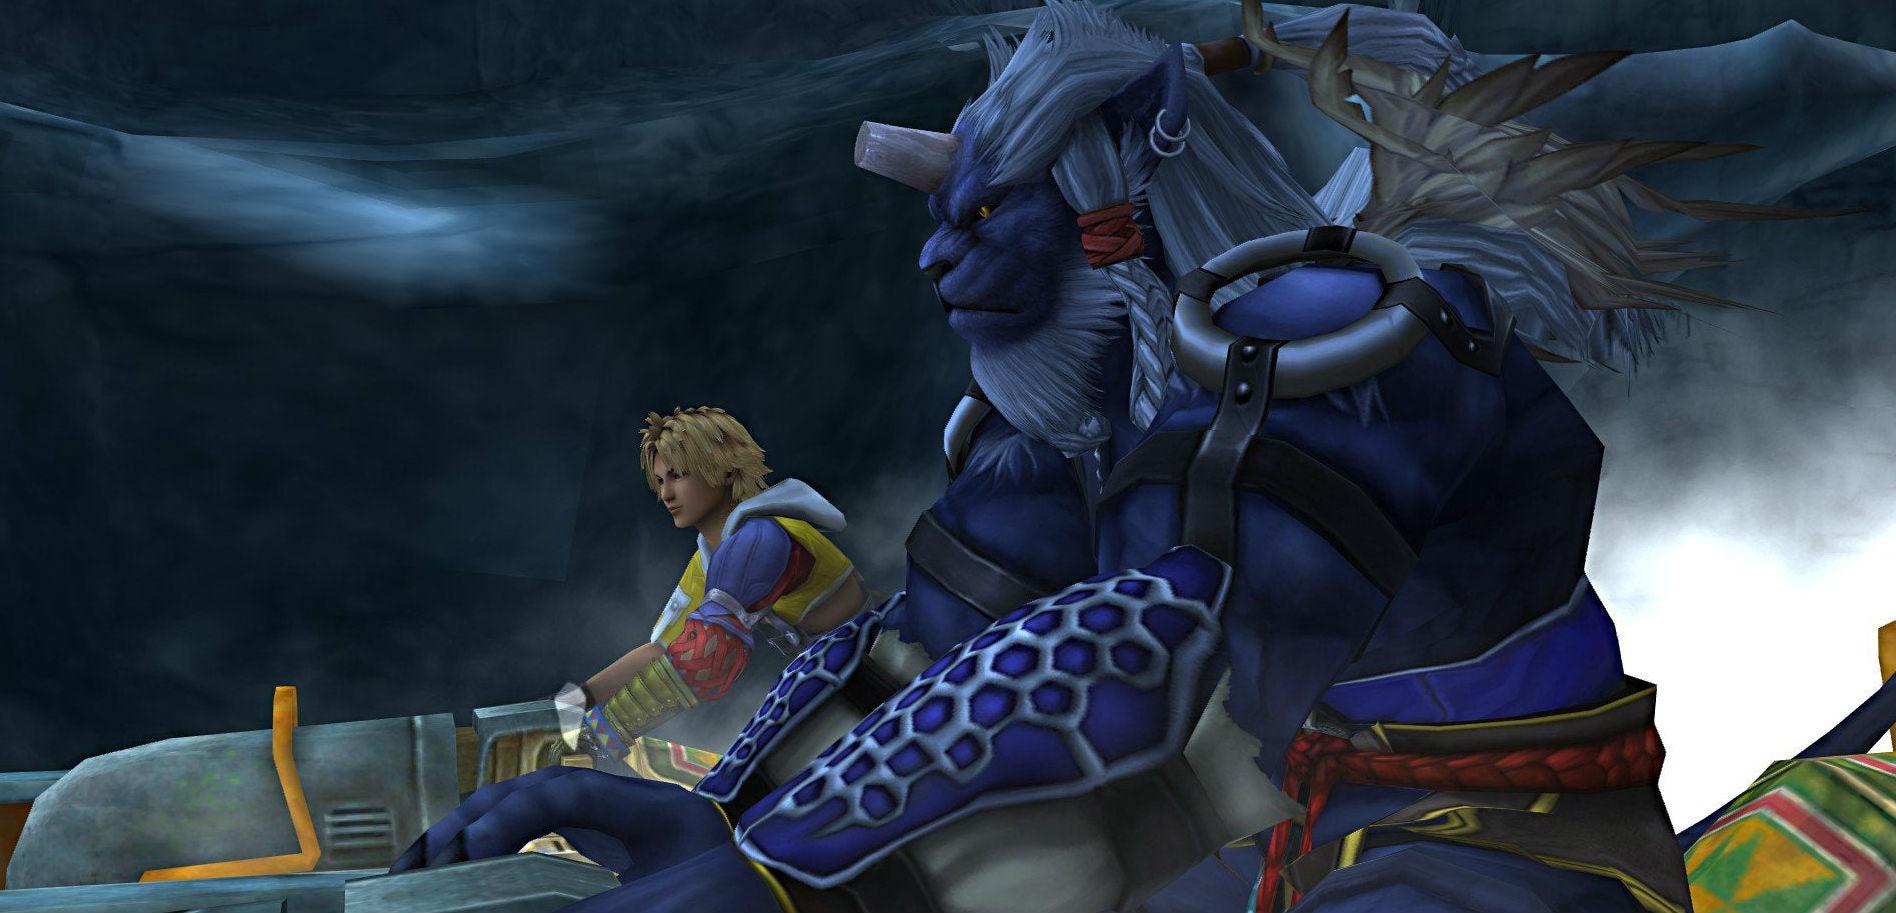 Kimahri, a Final Fantasy character that gets no respect, is now part of Dissidia Final Fantasy Opera screenshot